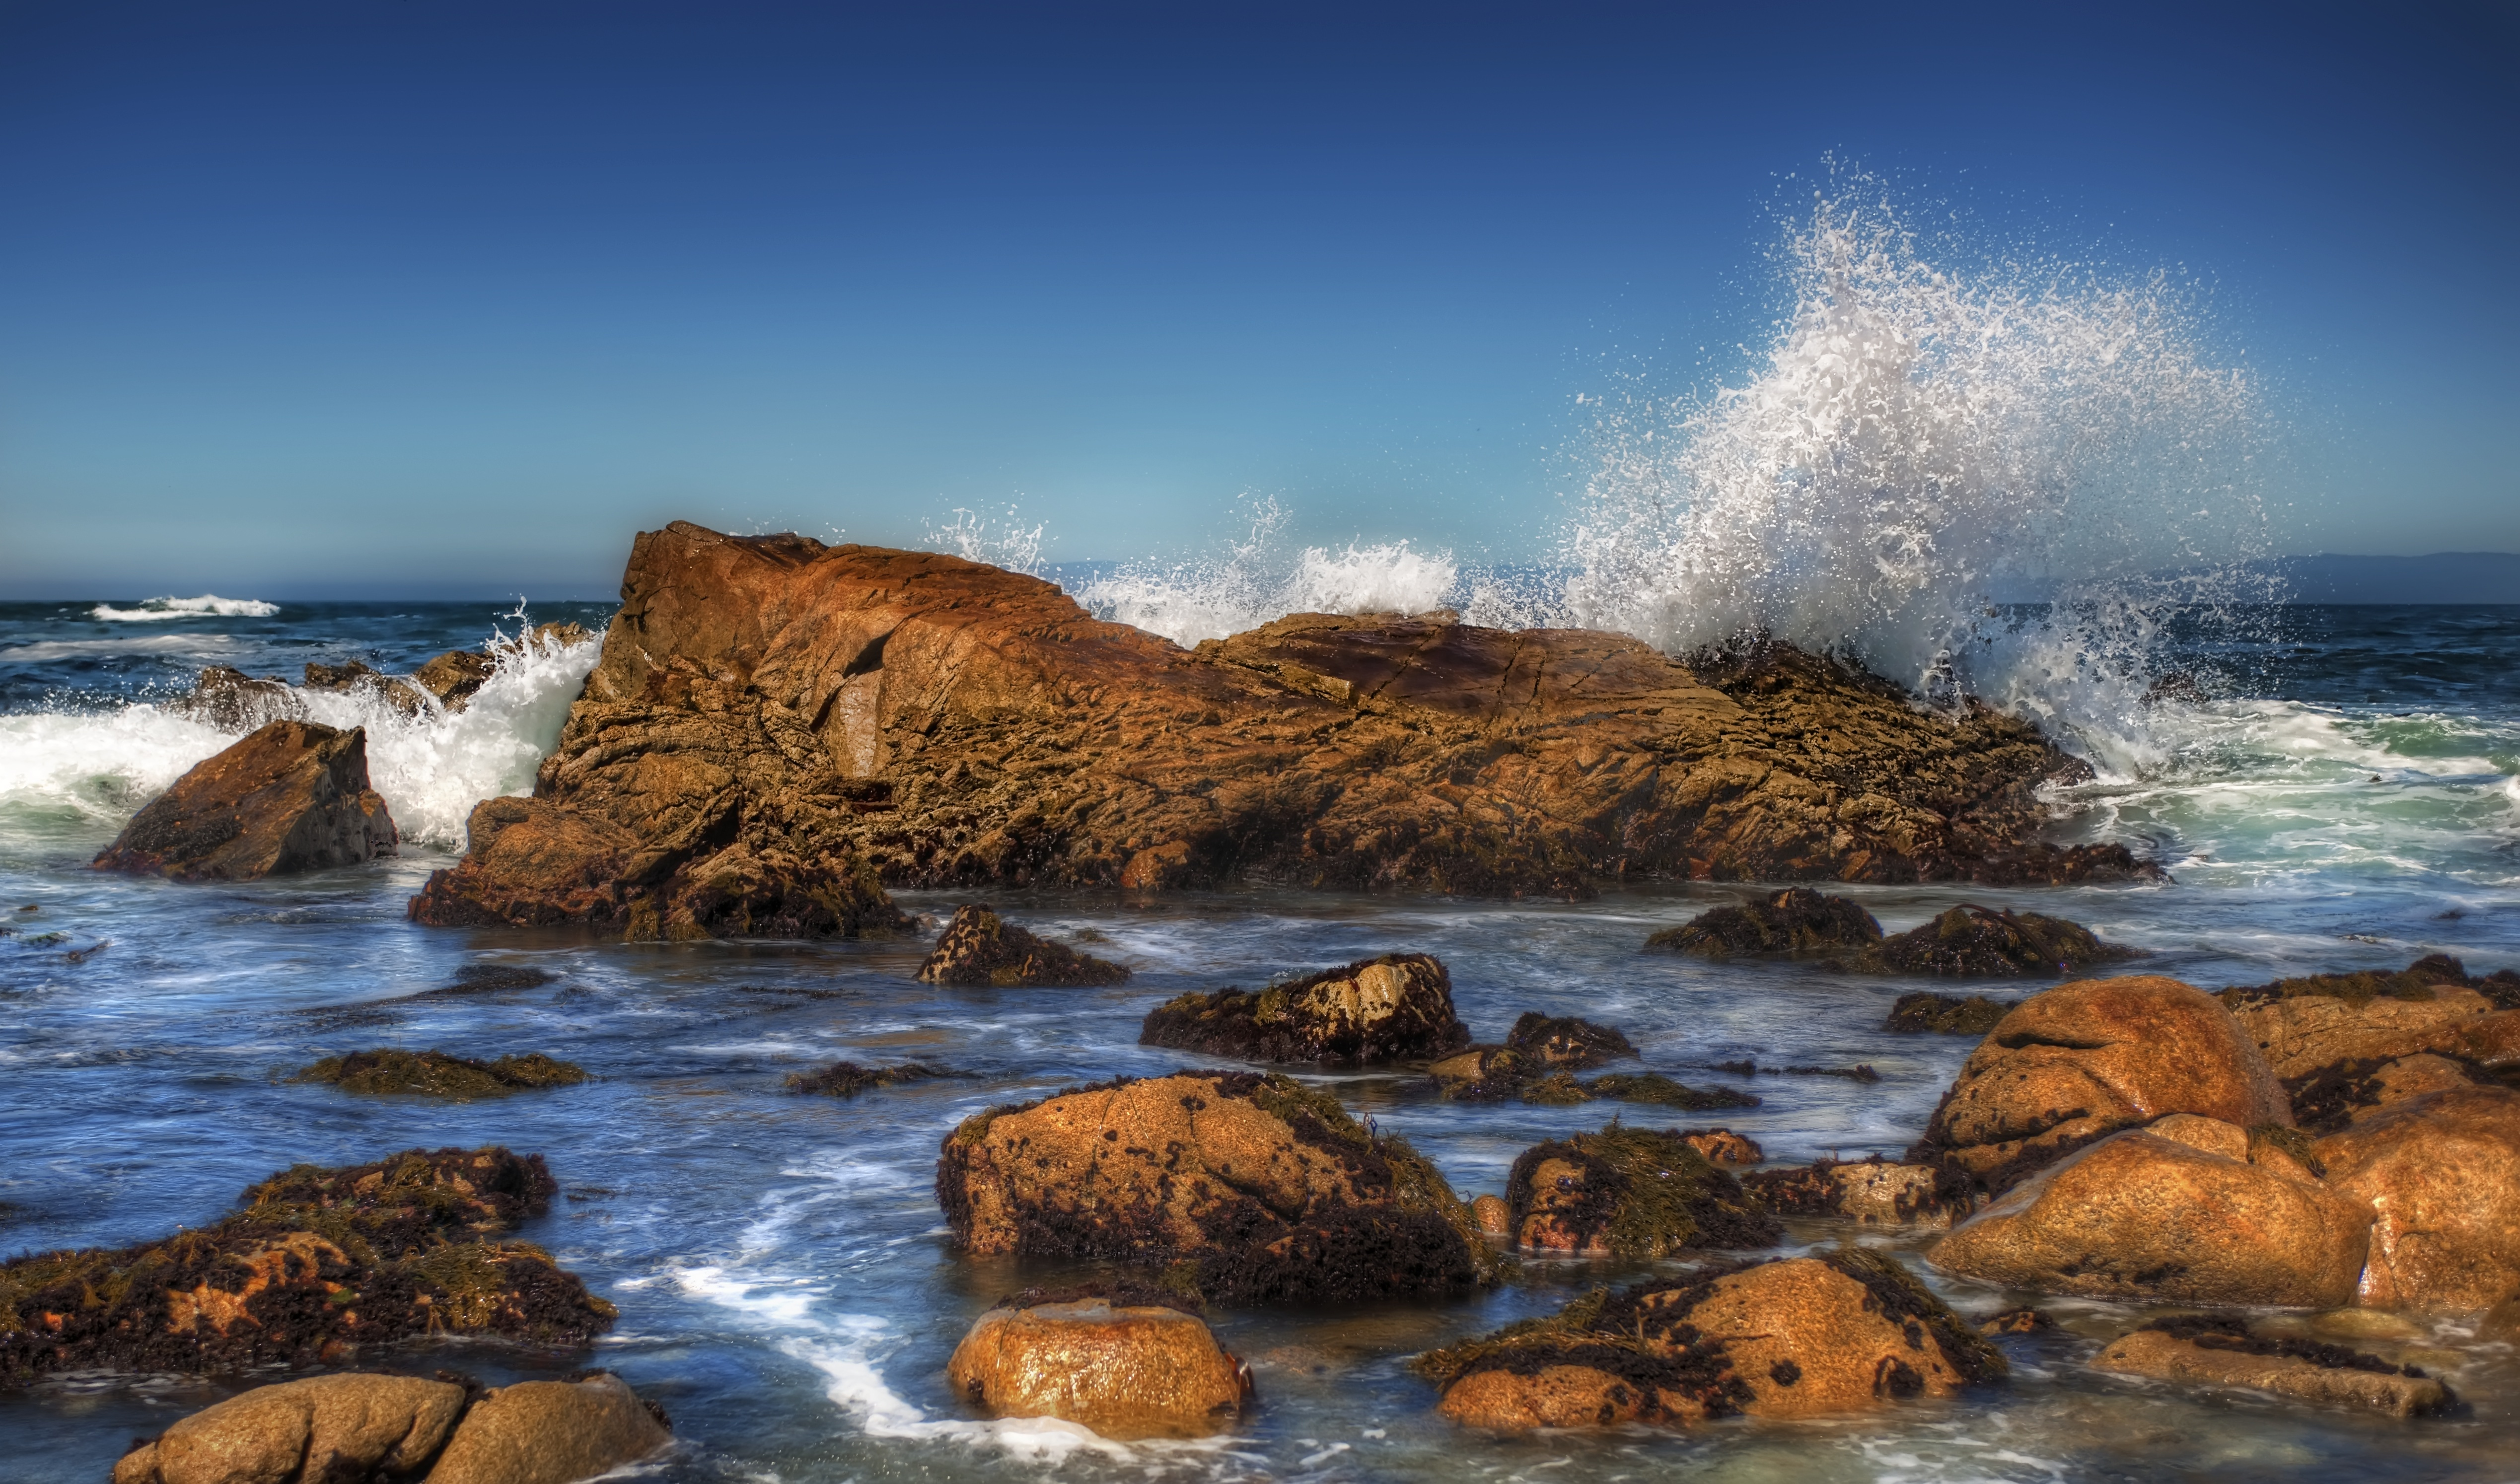 брызги вода море камень  № 2149703 без смс